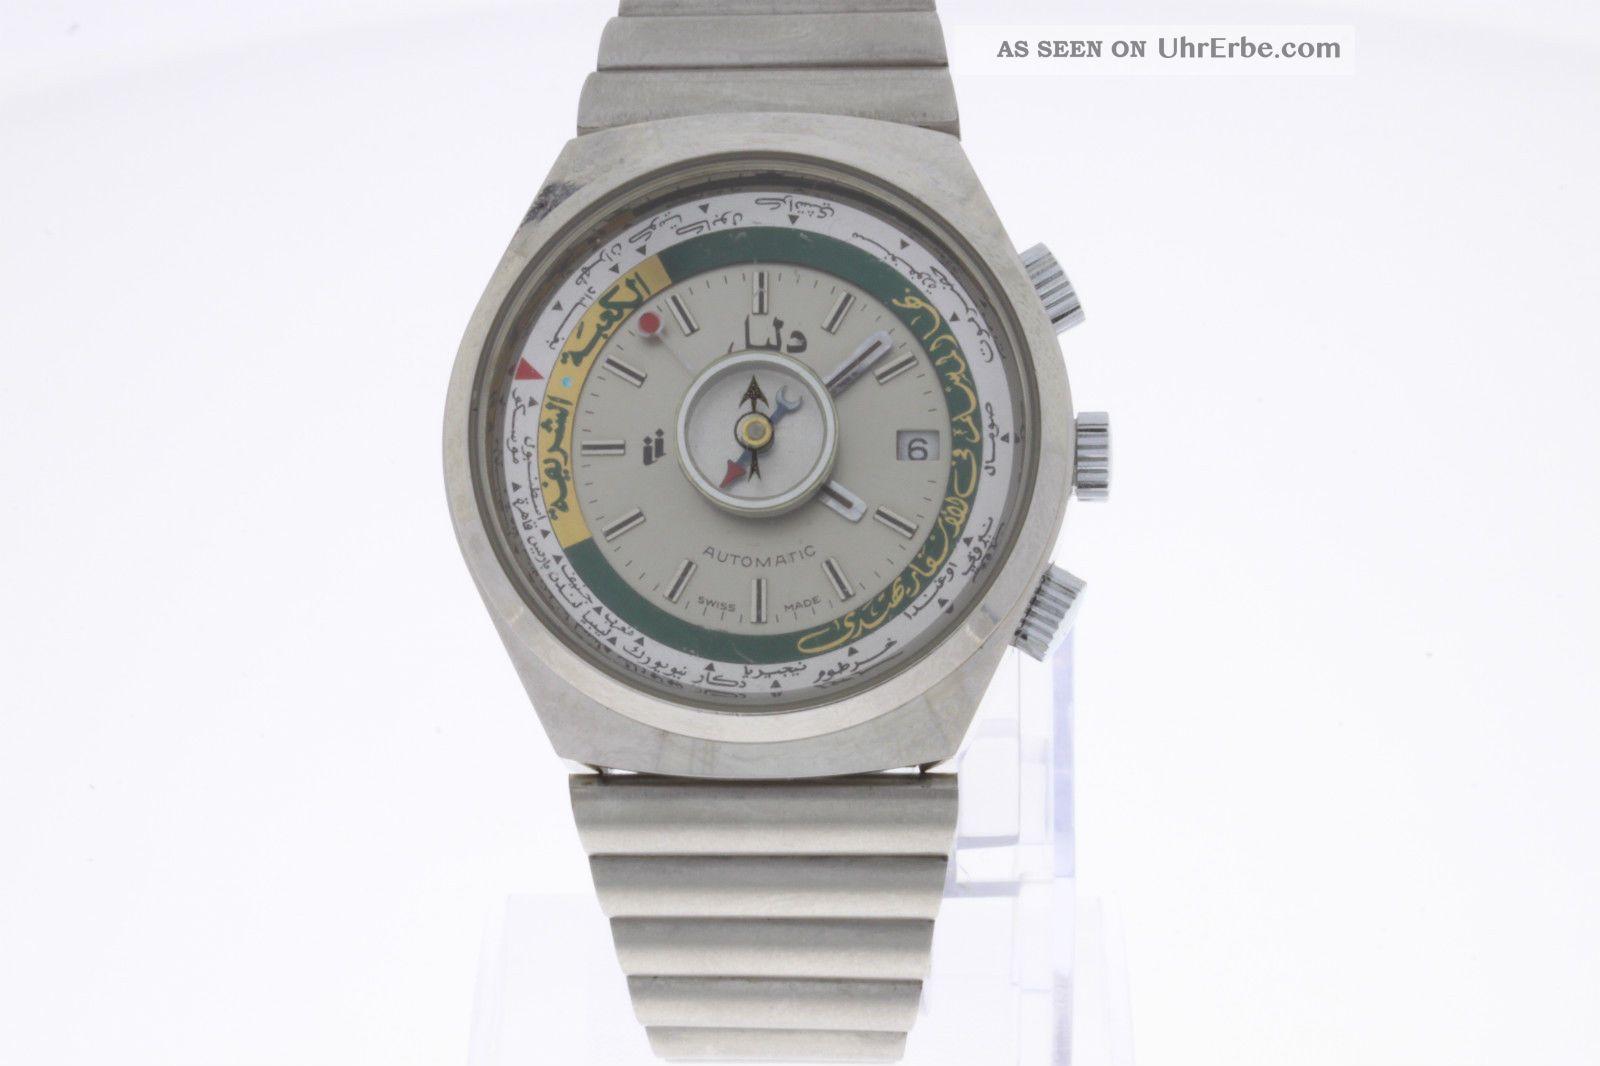 Vintage Armbanduhr Mit Automatikwerk Und Kompass Armbanduhren Bild